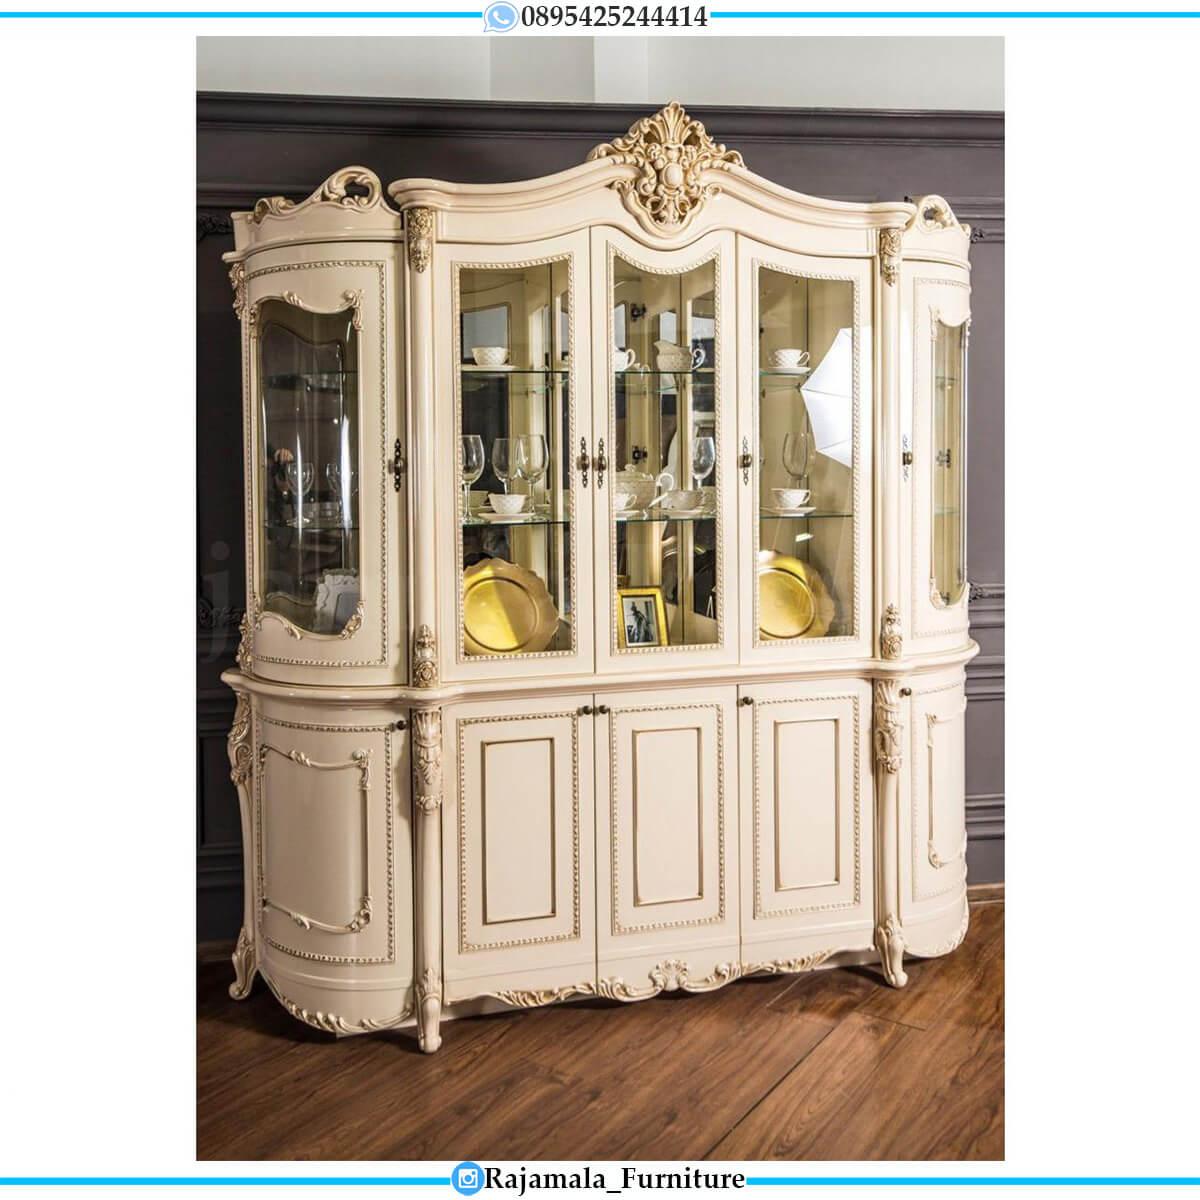 Desain Lemari Hias Mewah Luxury Carving Crown Style Furniture Jepara RM-0565